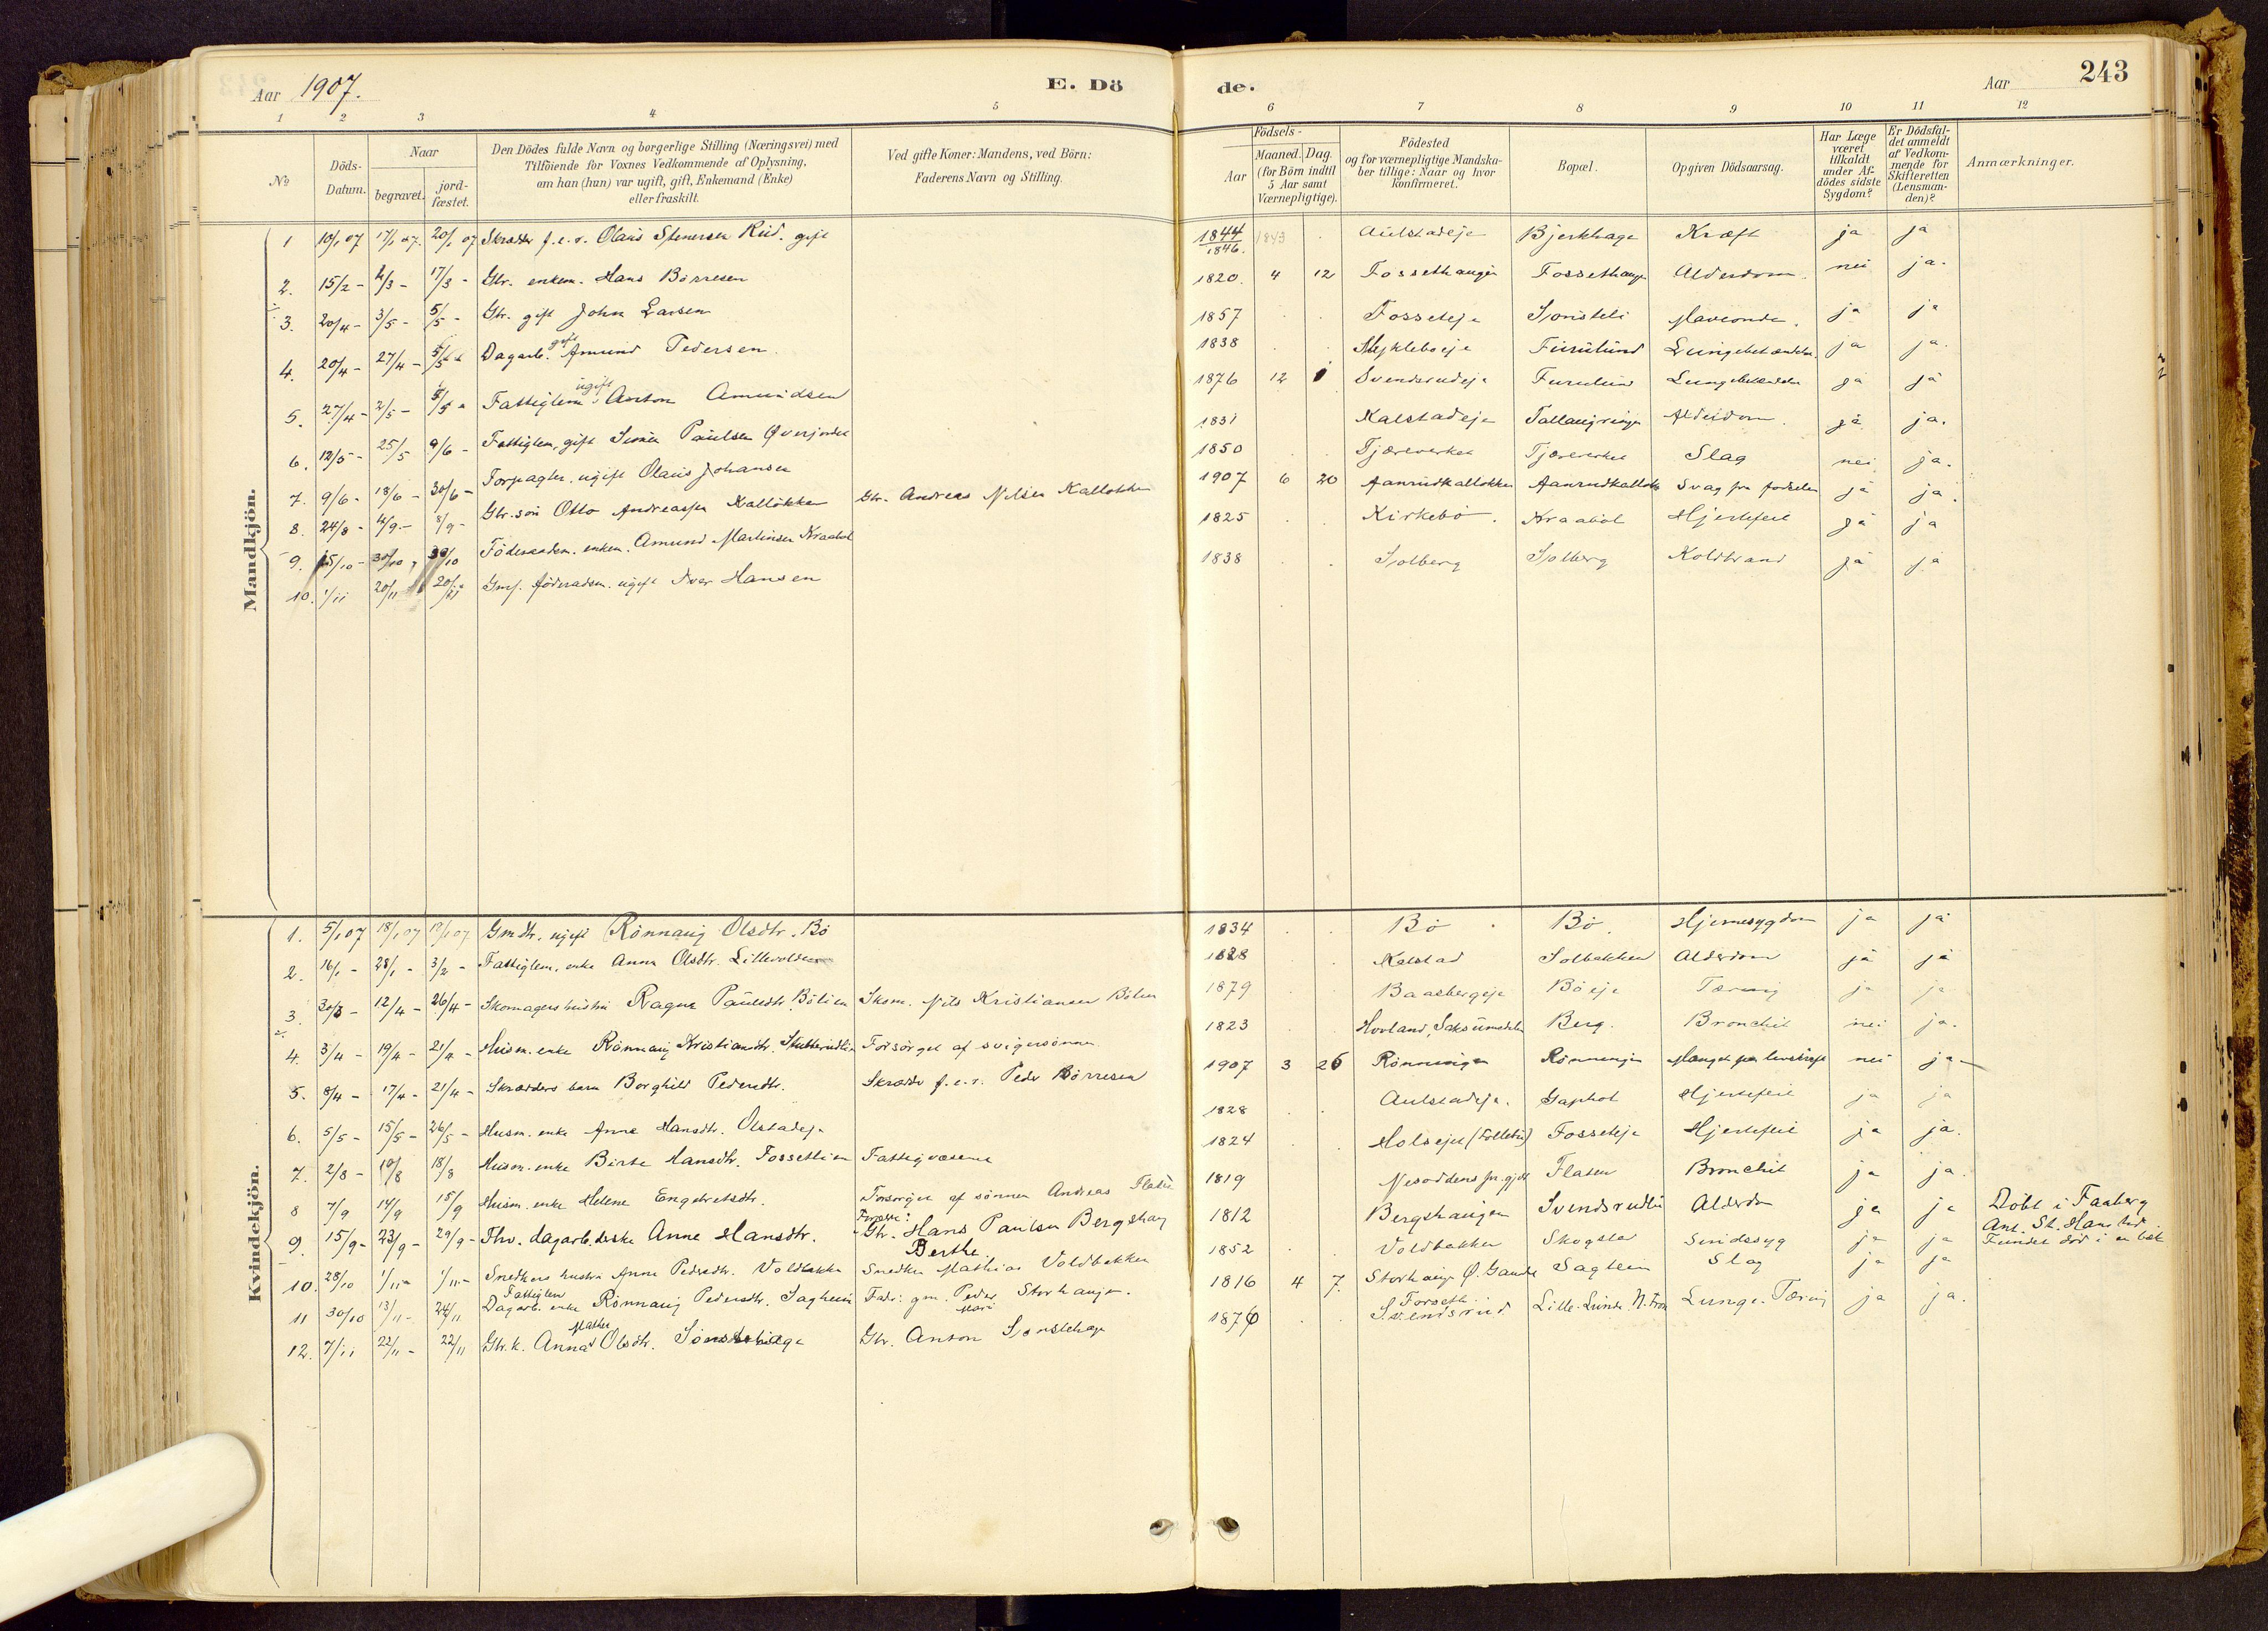 SAH, Vestre Gausdal prestekontor, Ministerialbok nr. 1, 1887-1914, s. 243